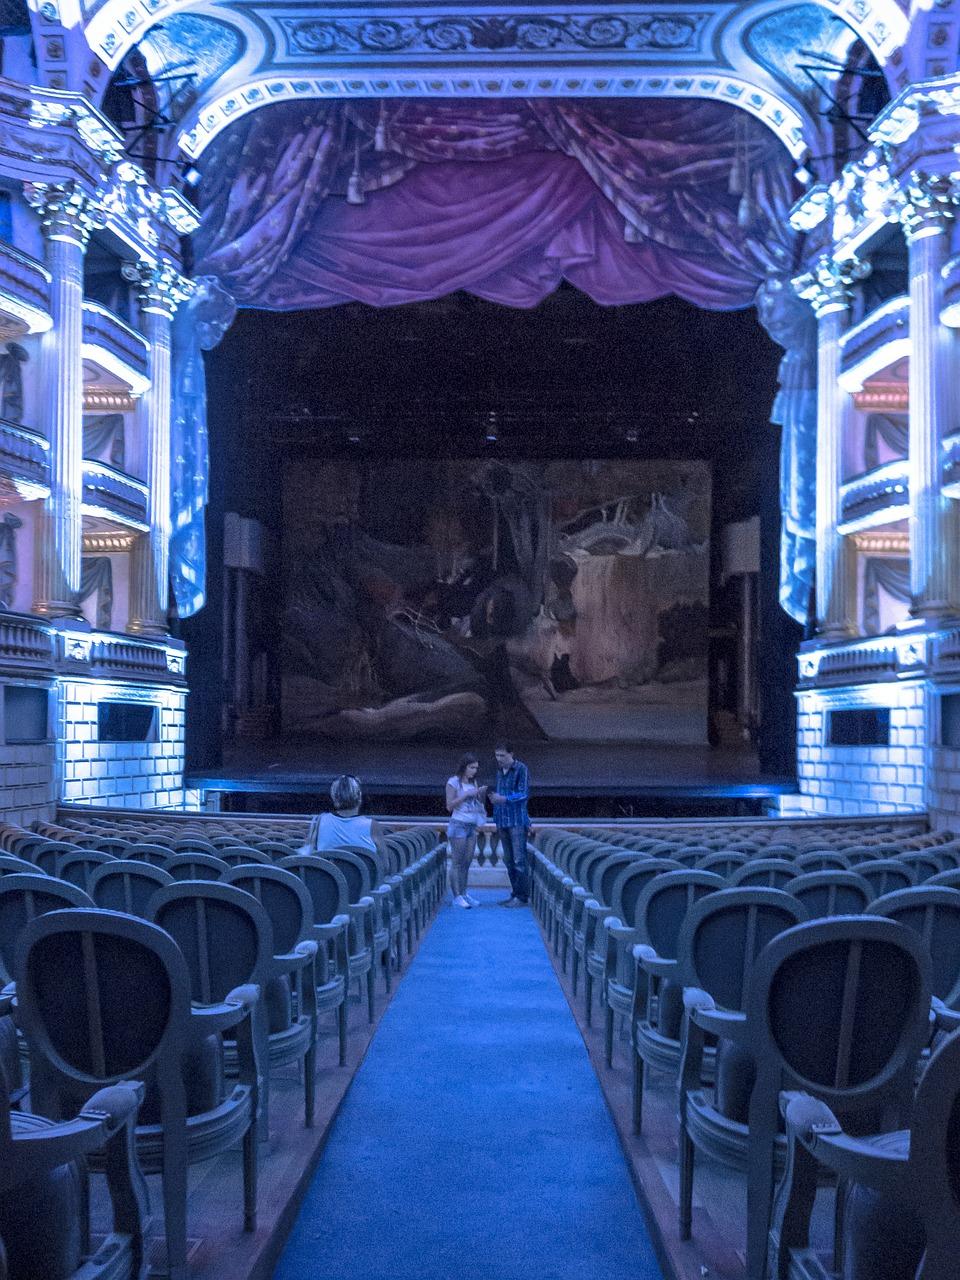 theatre-426448_1280.jpg